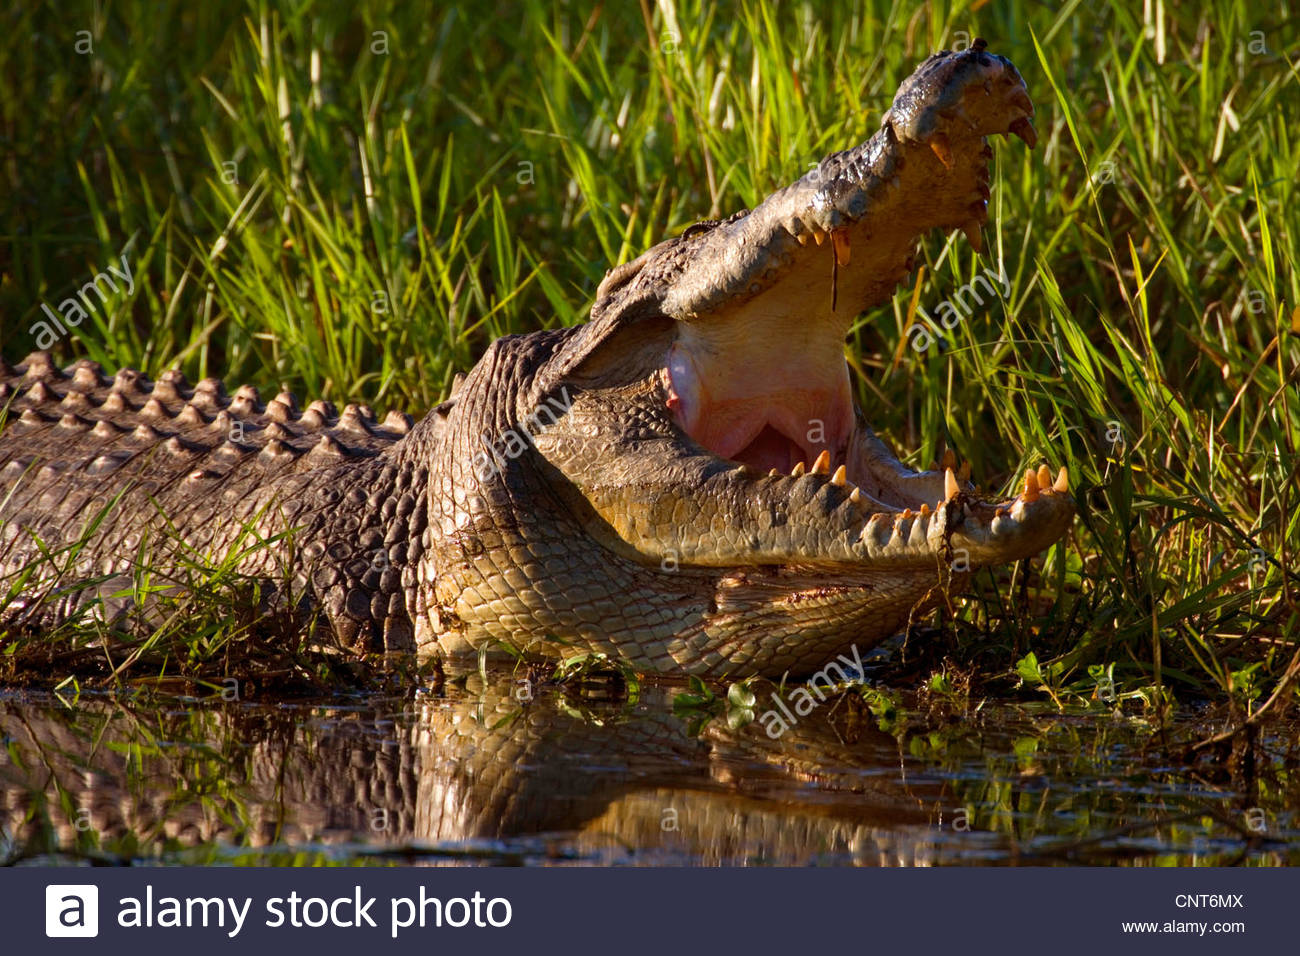 saltwater crocodile, estuarine crocodile (Crocodylus porosus), big Saltwater Crocodile lying at shore of a swamp - Stock Image